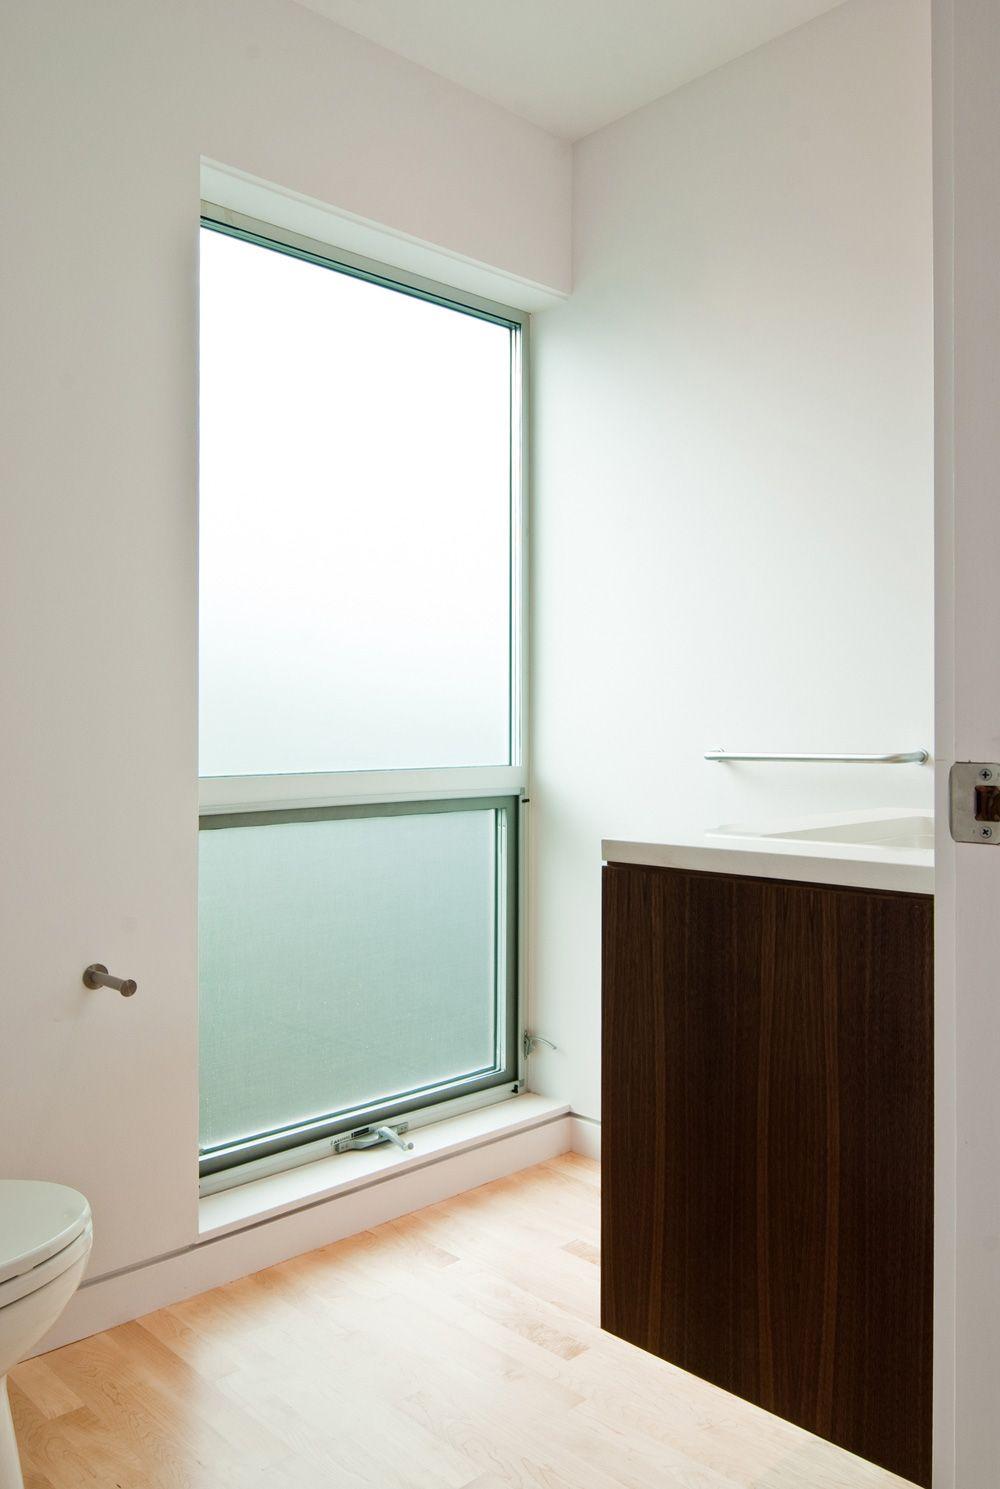 Top 10 Things To Know About Aluminum Windows Modern Powder Rooms Aluminium Windows Dream Bathrooms